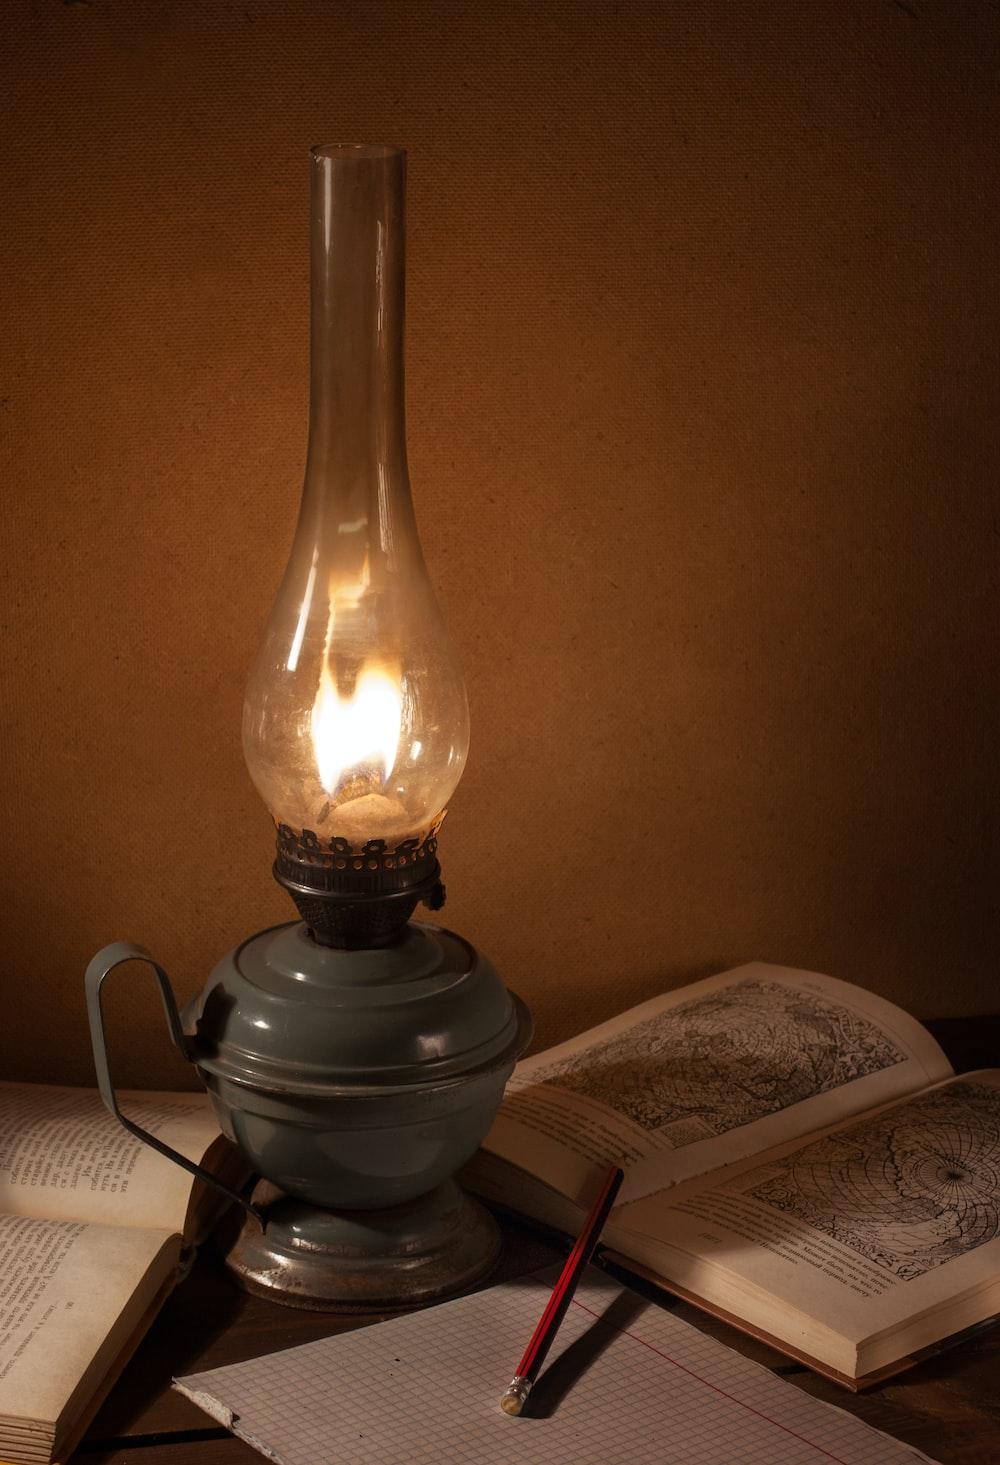 gray oil lamp beside book